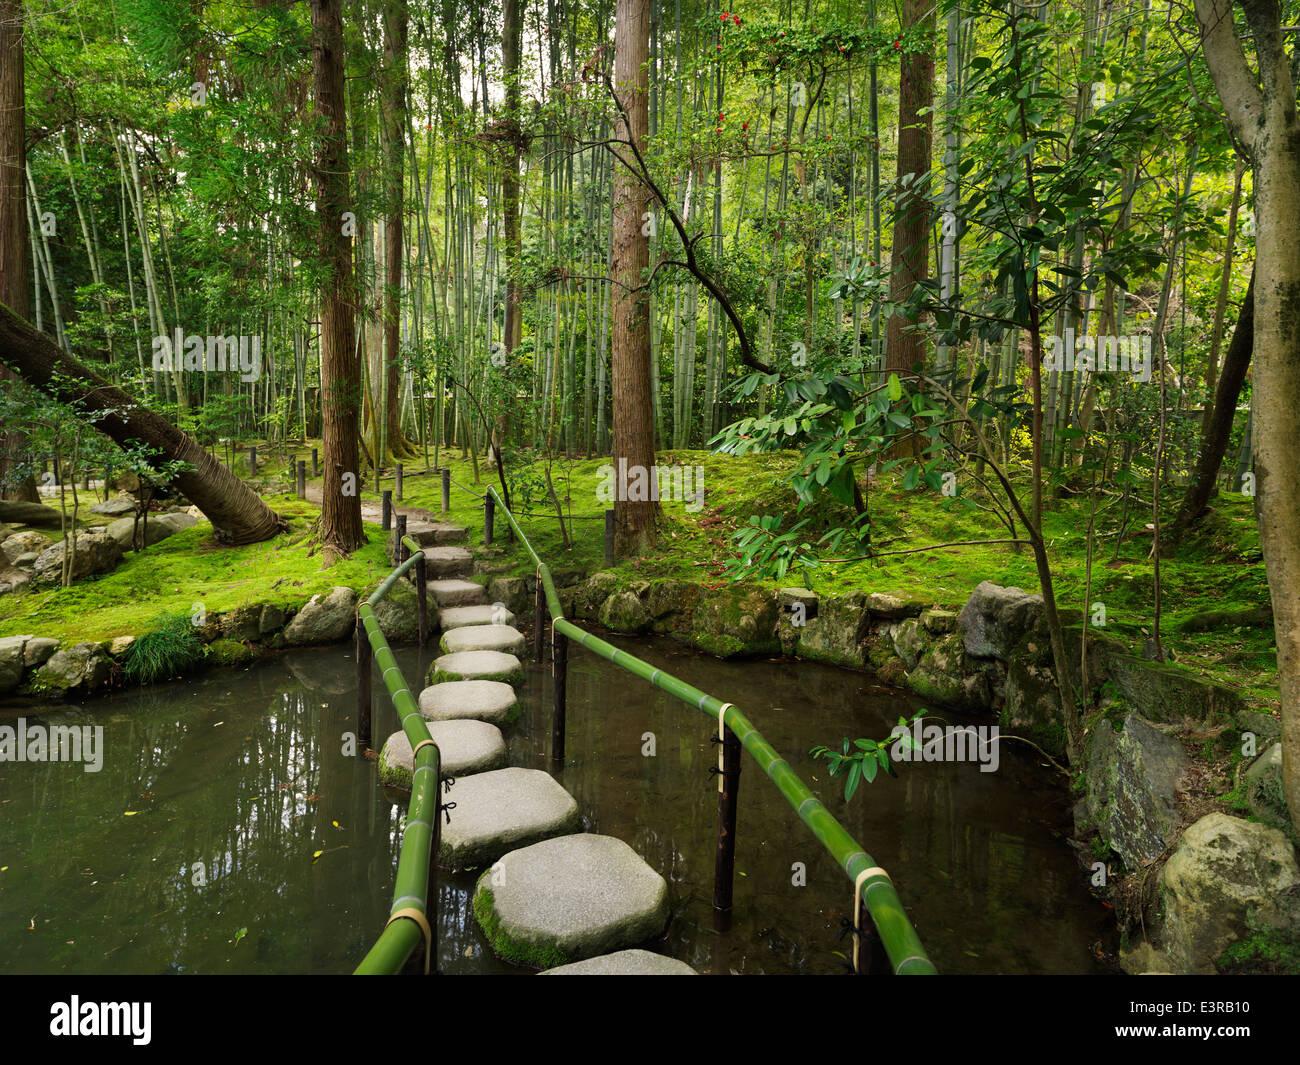 bamboo pond japanese stockfotos bamboo pond japanese bilder alamy. Black Bedroom Furniture Sets. Home Design Ideas